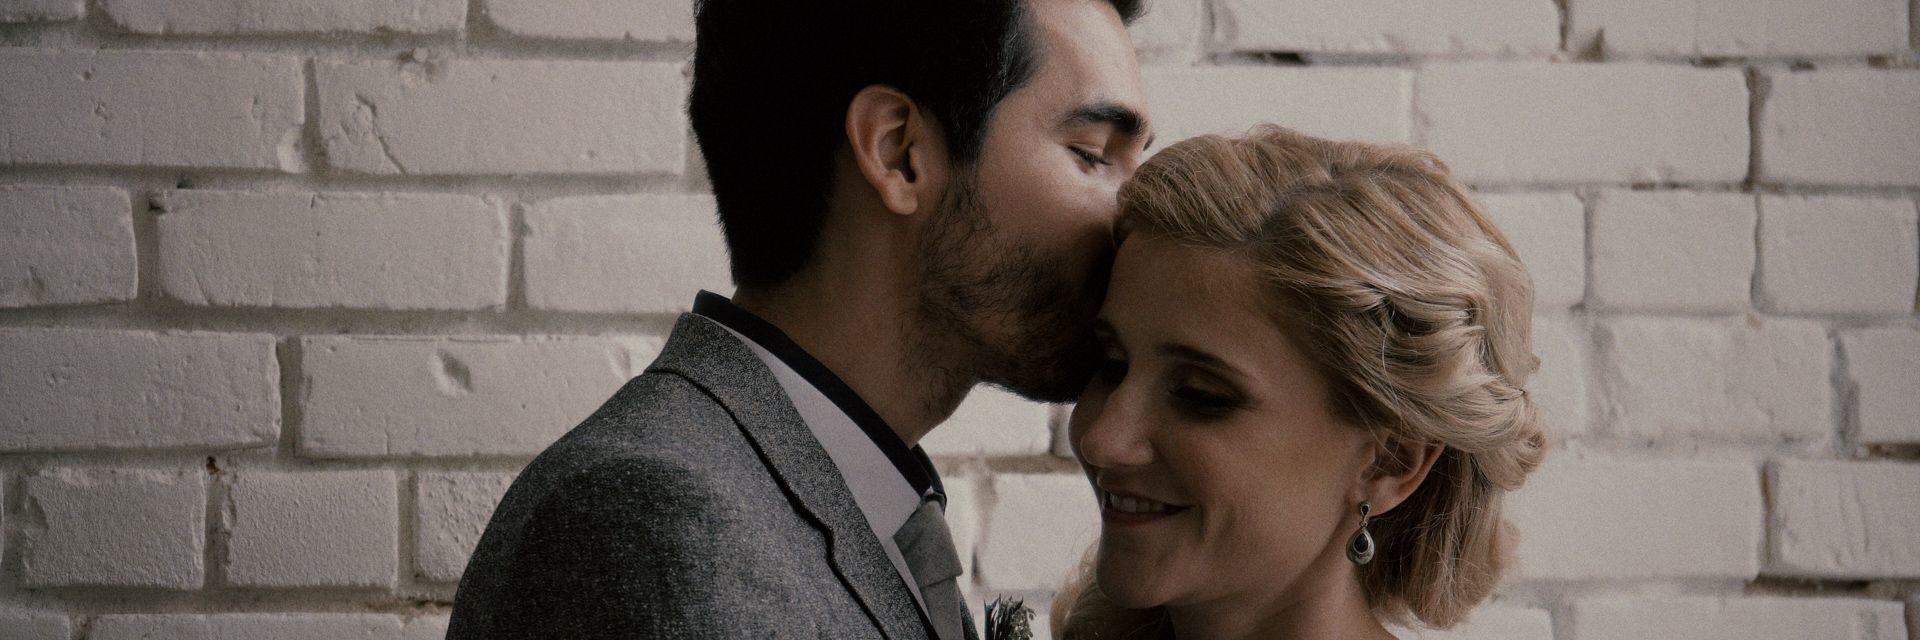 porto-wedding-videographer-cinemate-films-03